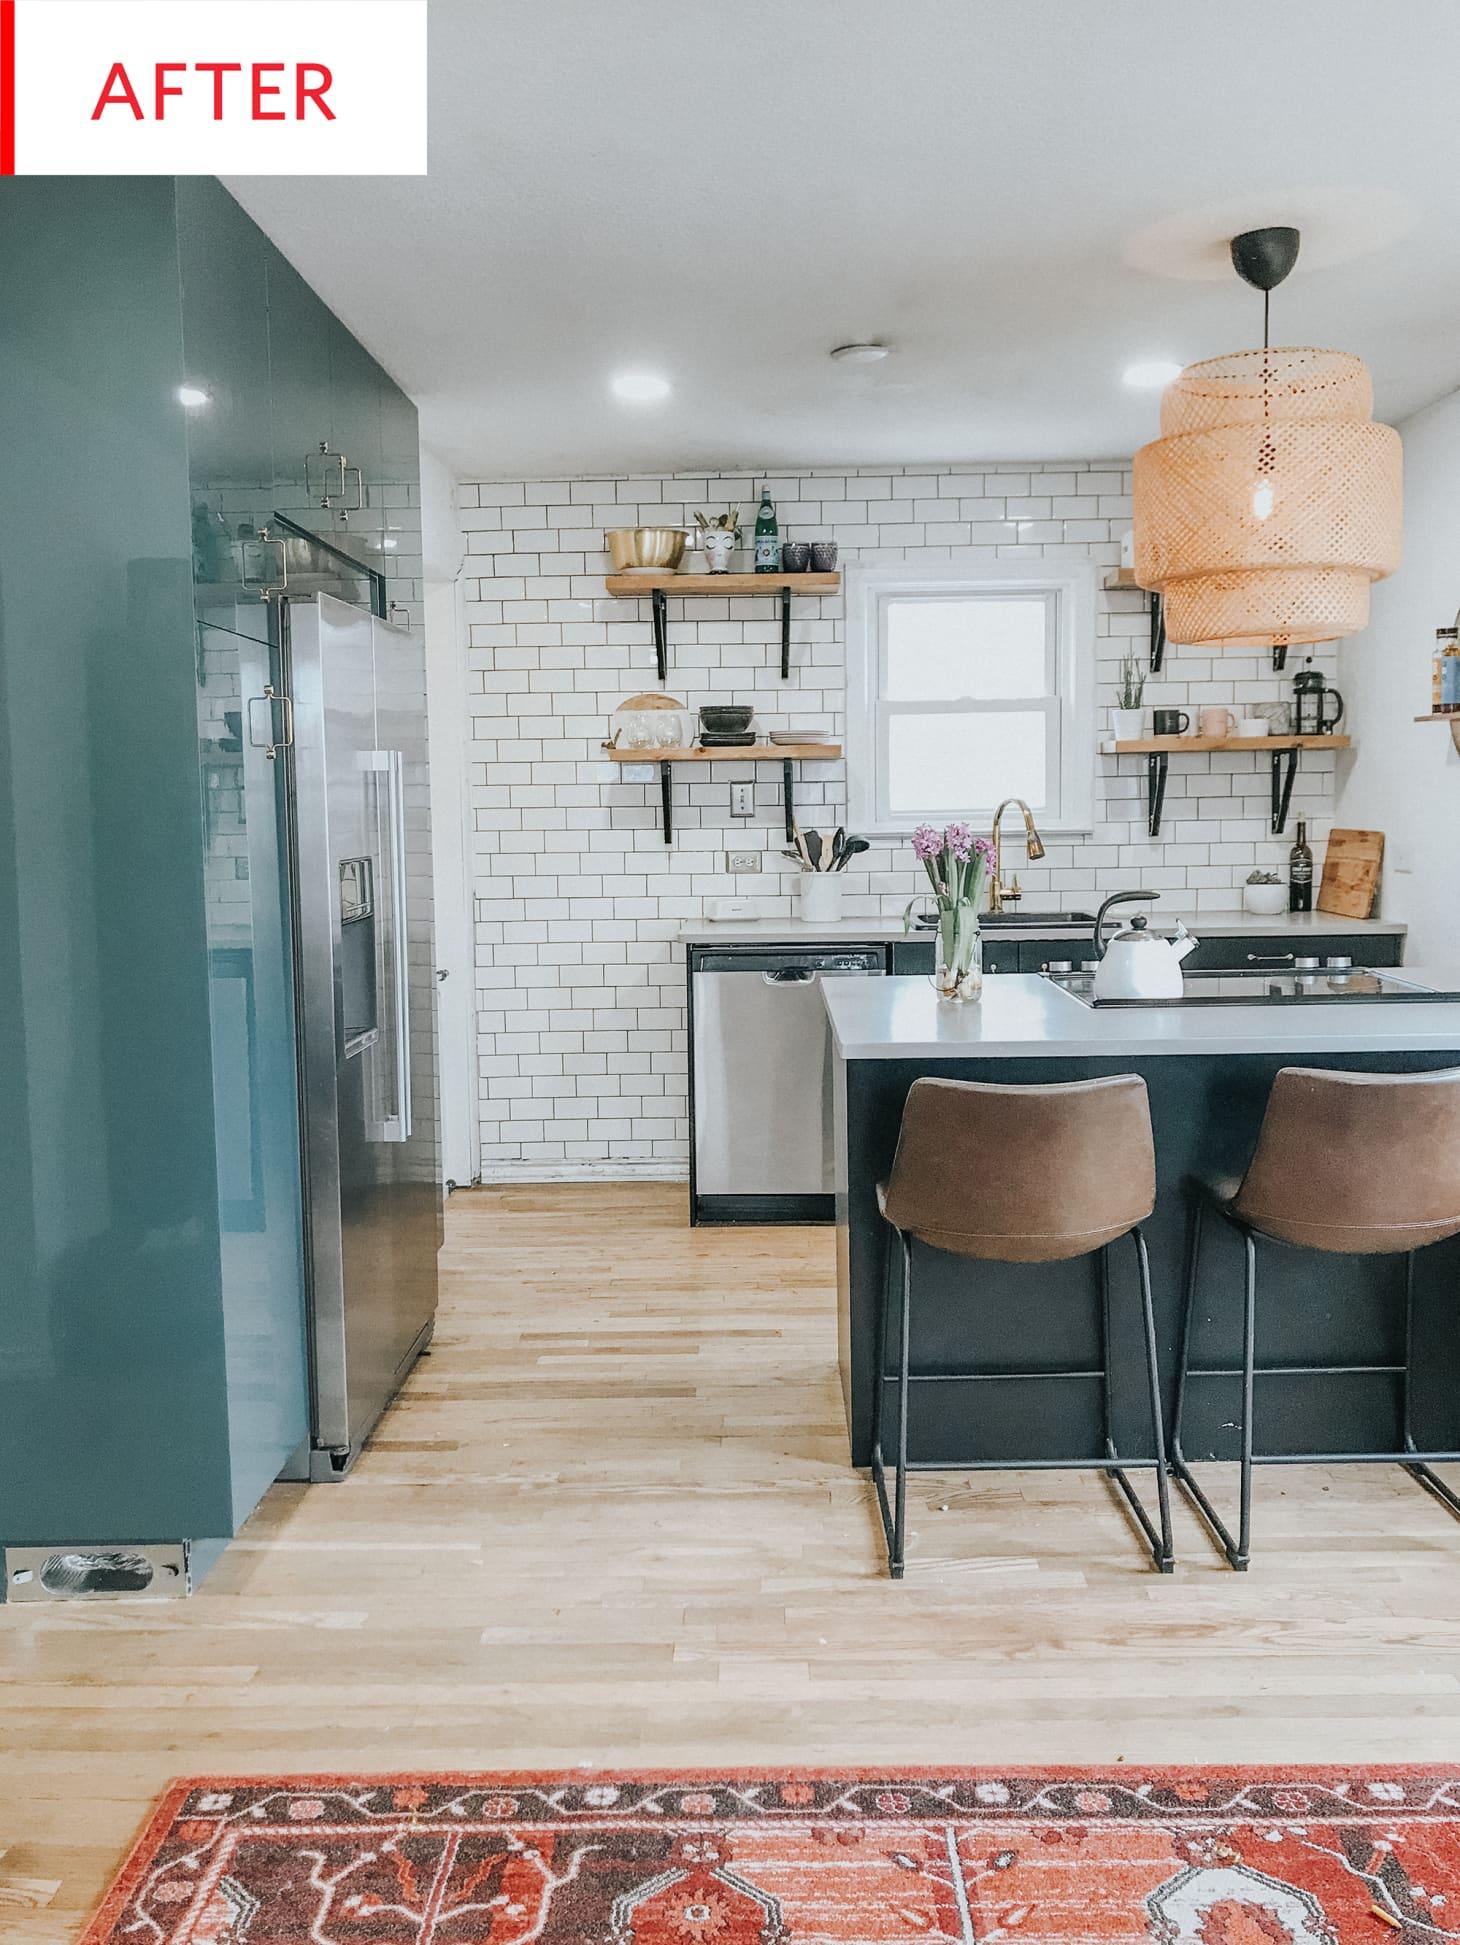 Ikea Kitchen Makeover - Green Cabinets | Kitchn